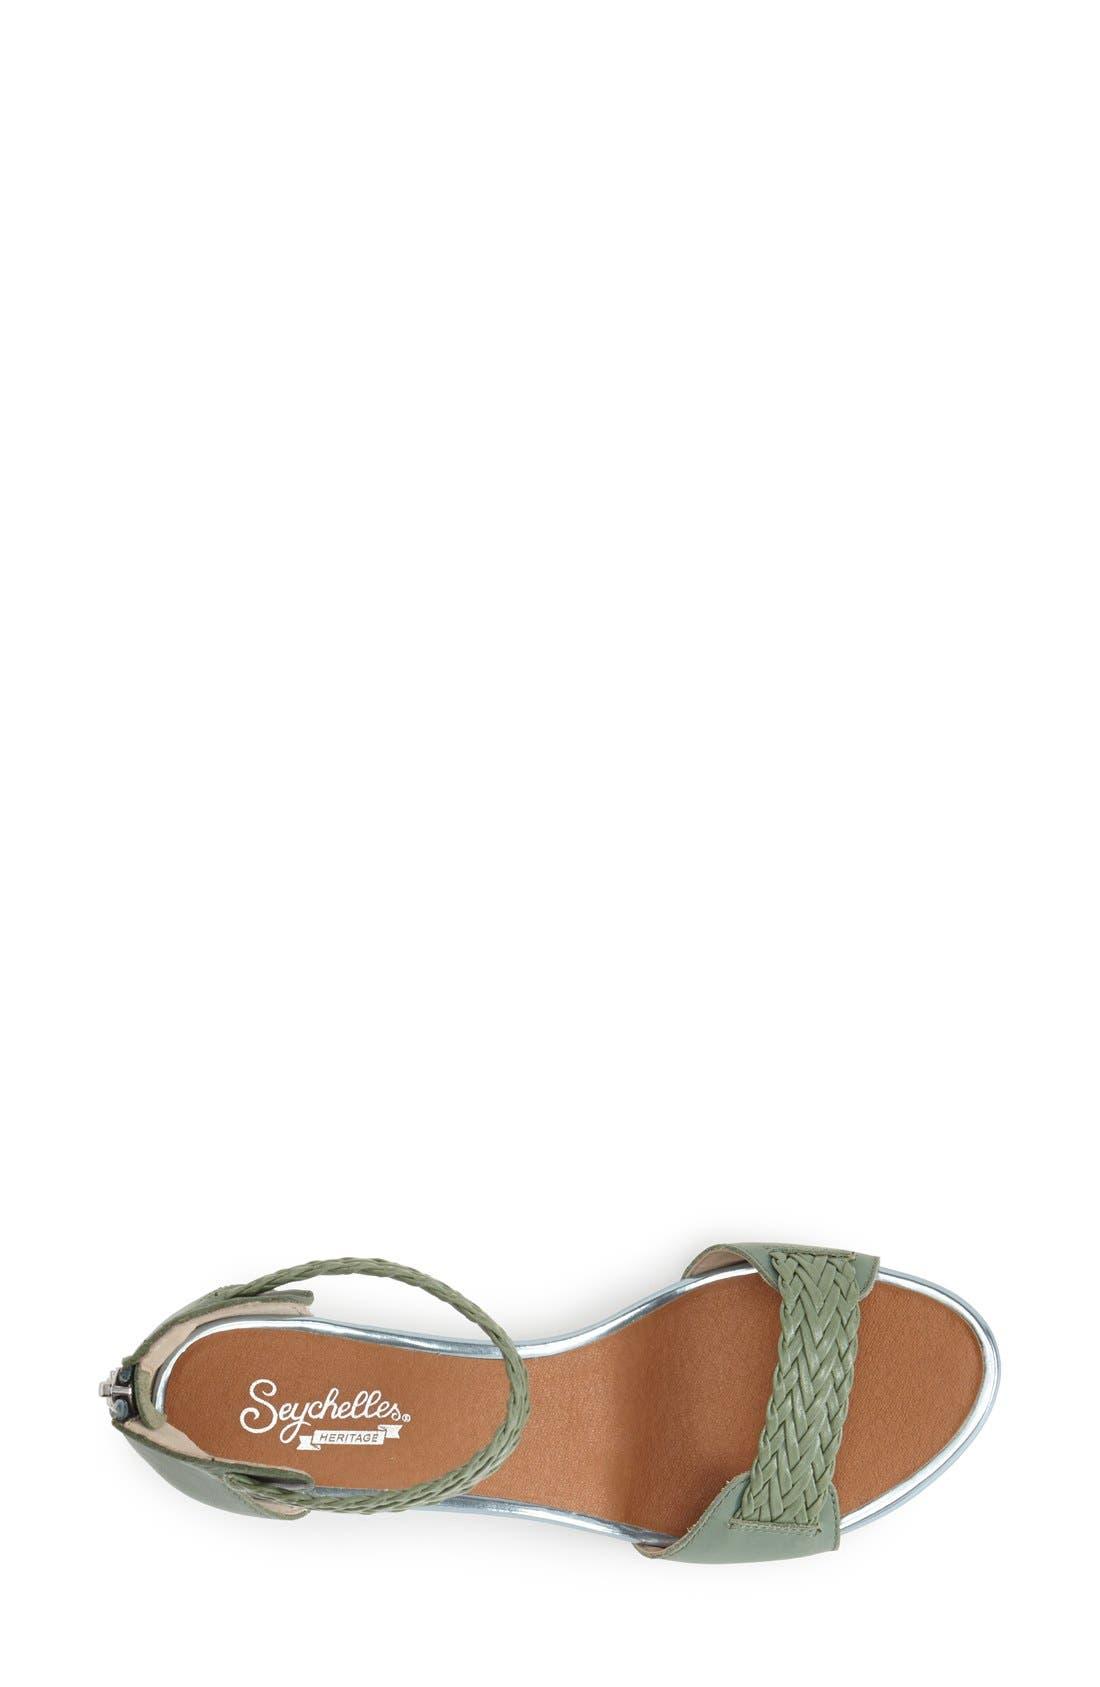 Alternate Image 3  - Seychelles 'Spelling Bee' Leather Ankle Cuff Wedge Sandal (Women)